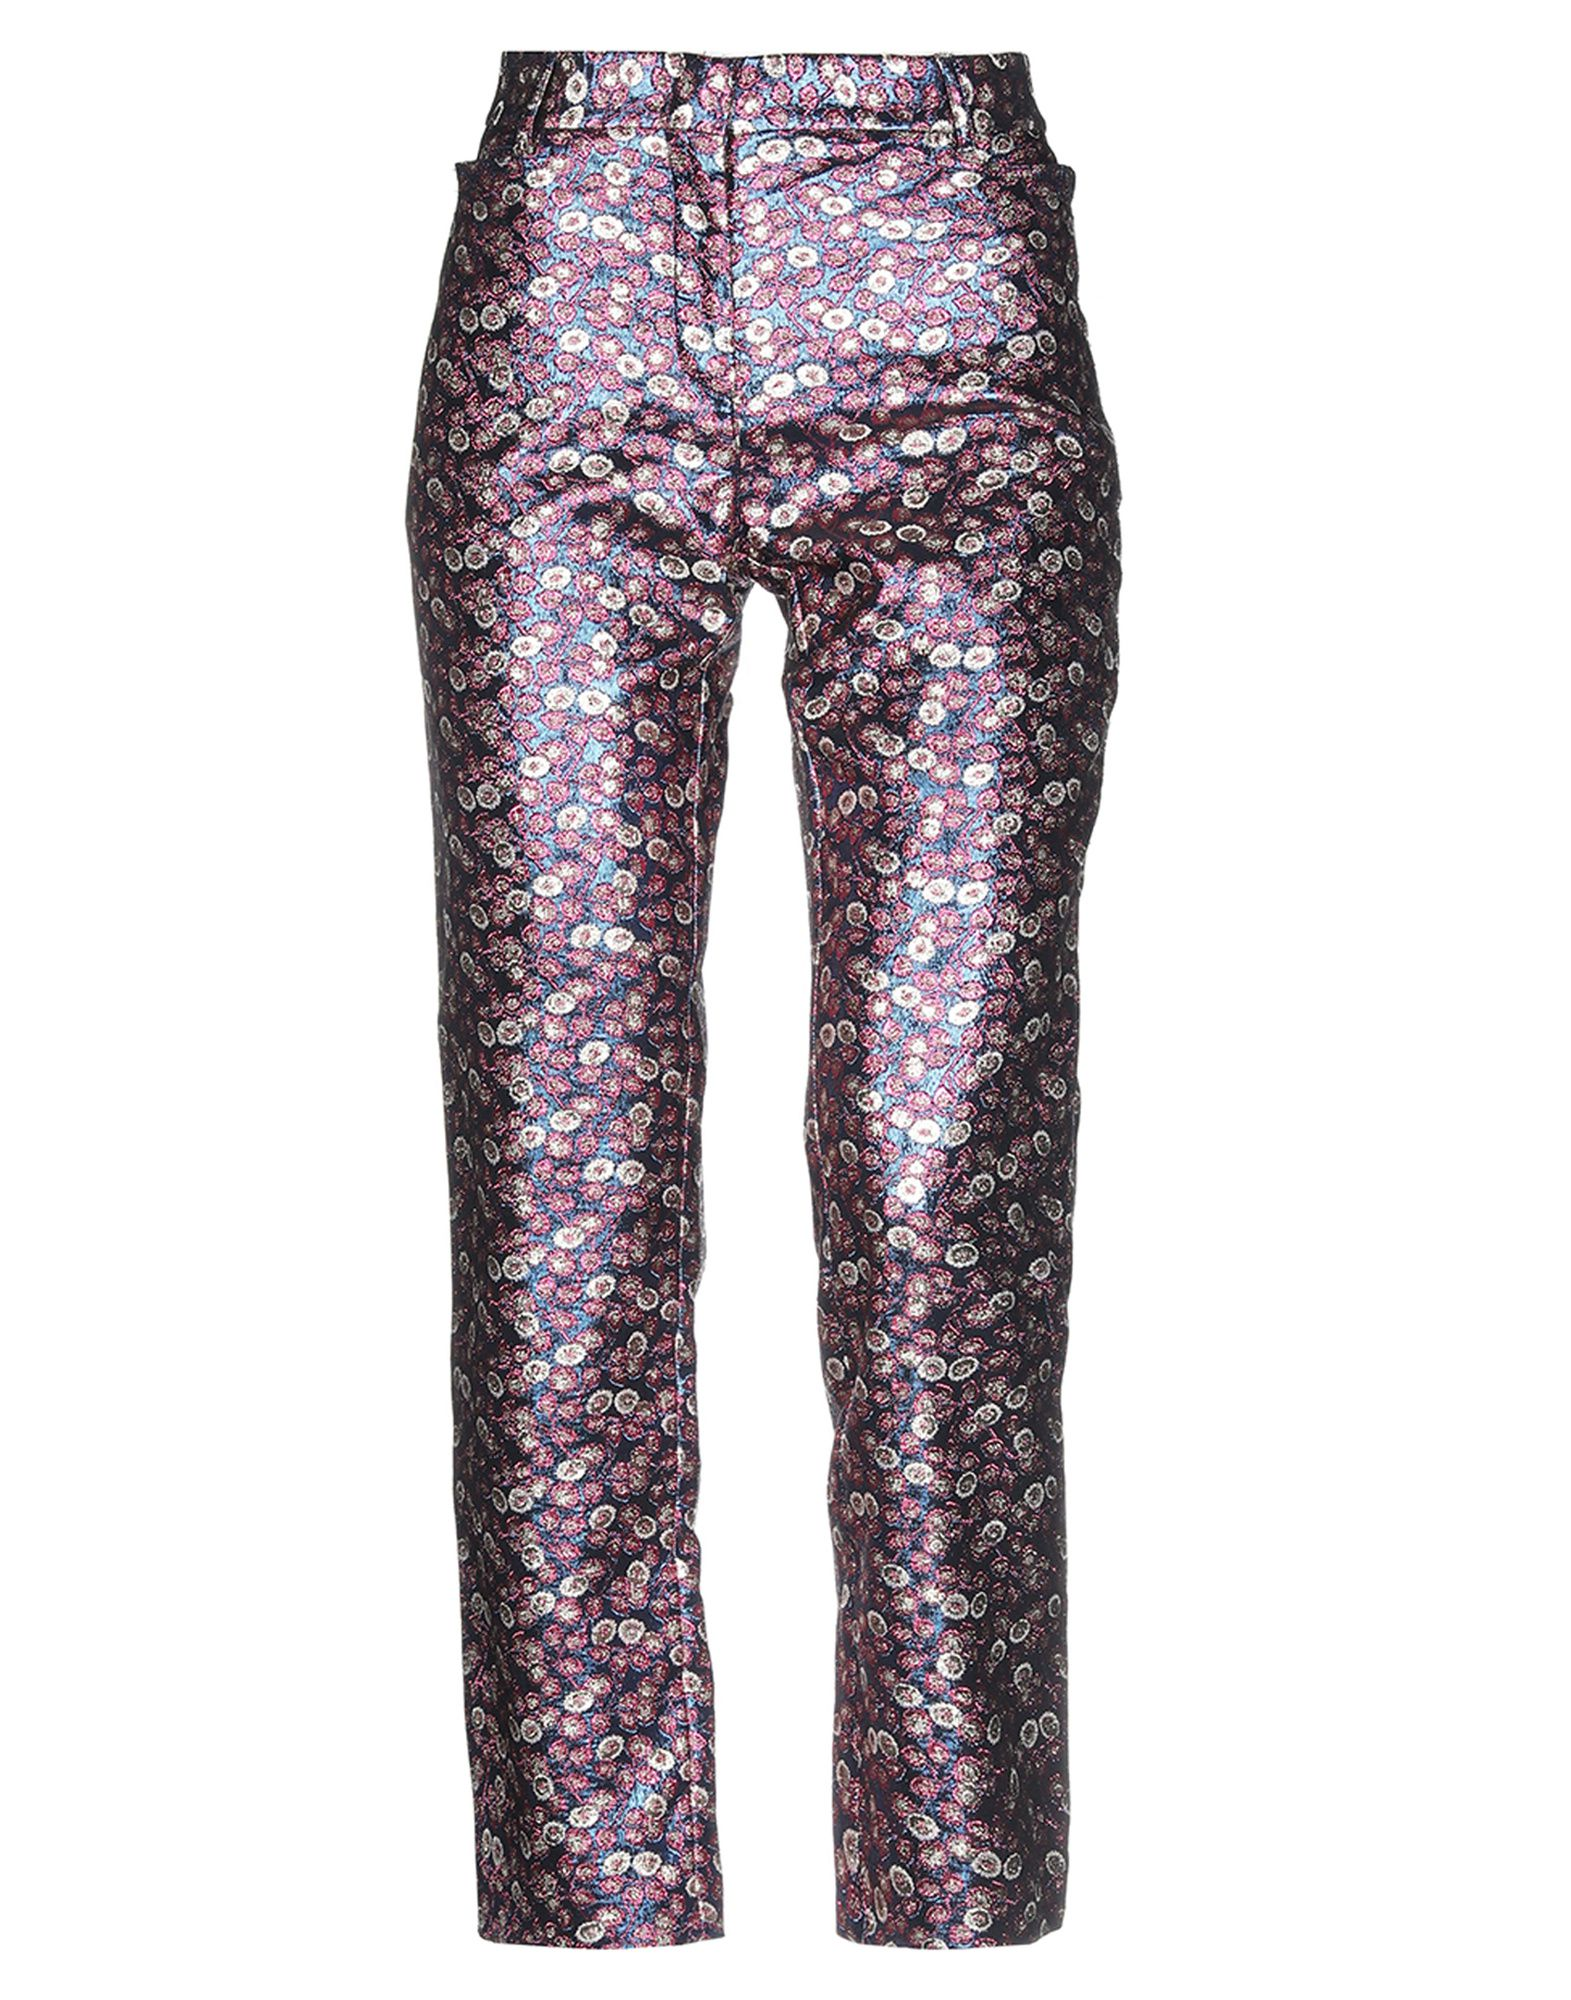 PHILOSOPHY di LORENZO SERAFINI Casual pants. brocade, no appliqués, floral design, high waisted, regular fit, straight leg, hook-and-bar, zip, multipockets. 100% Polyester